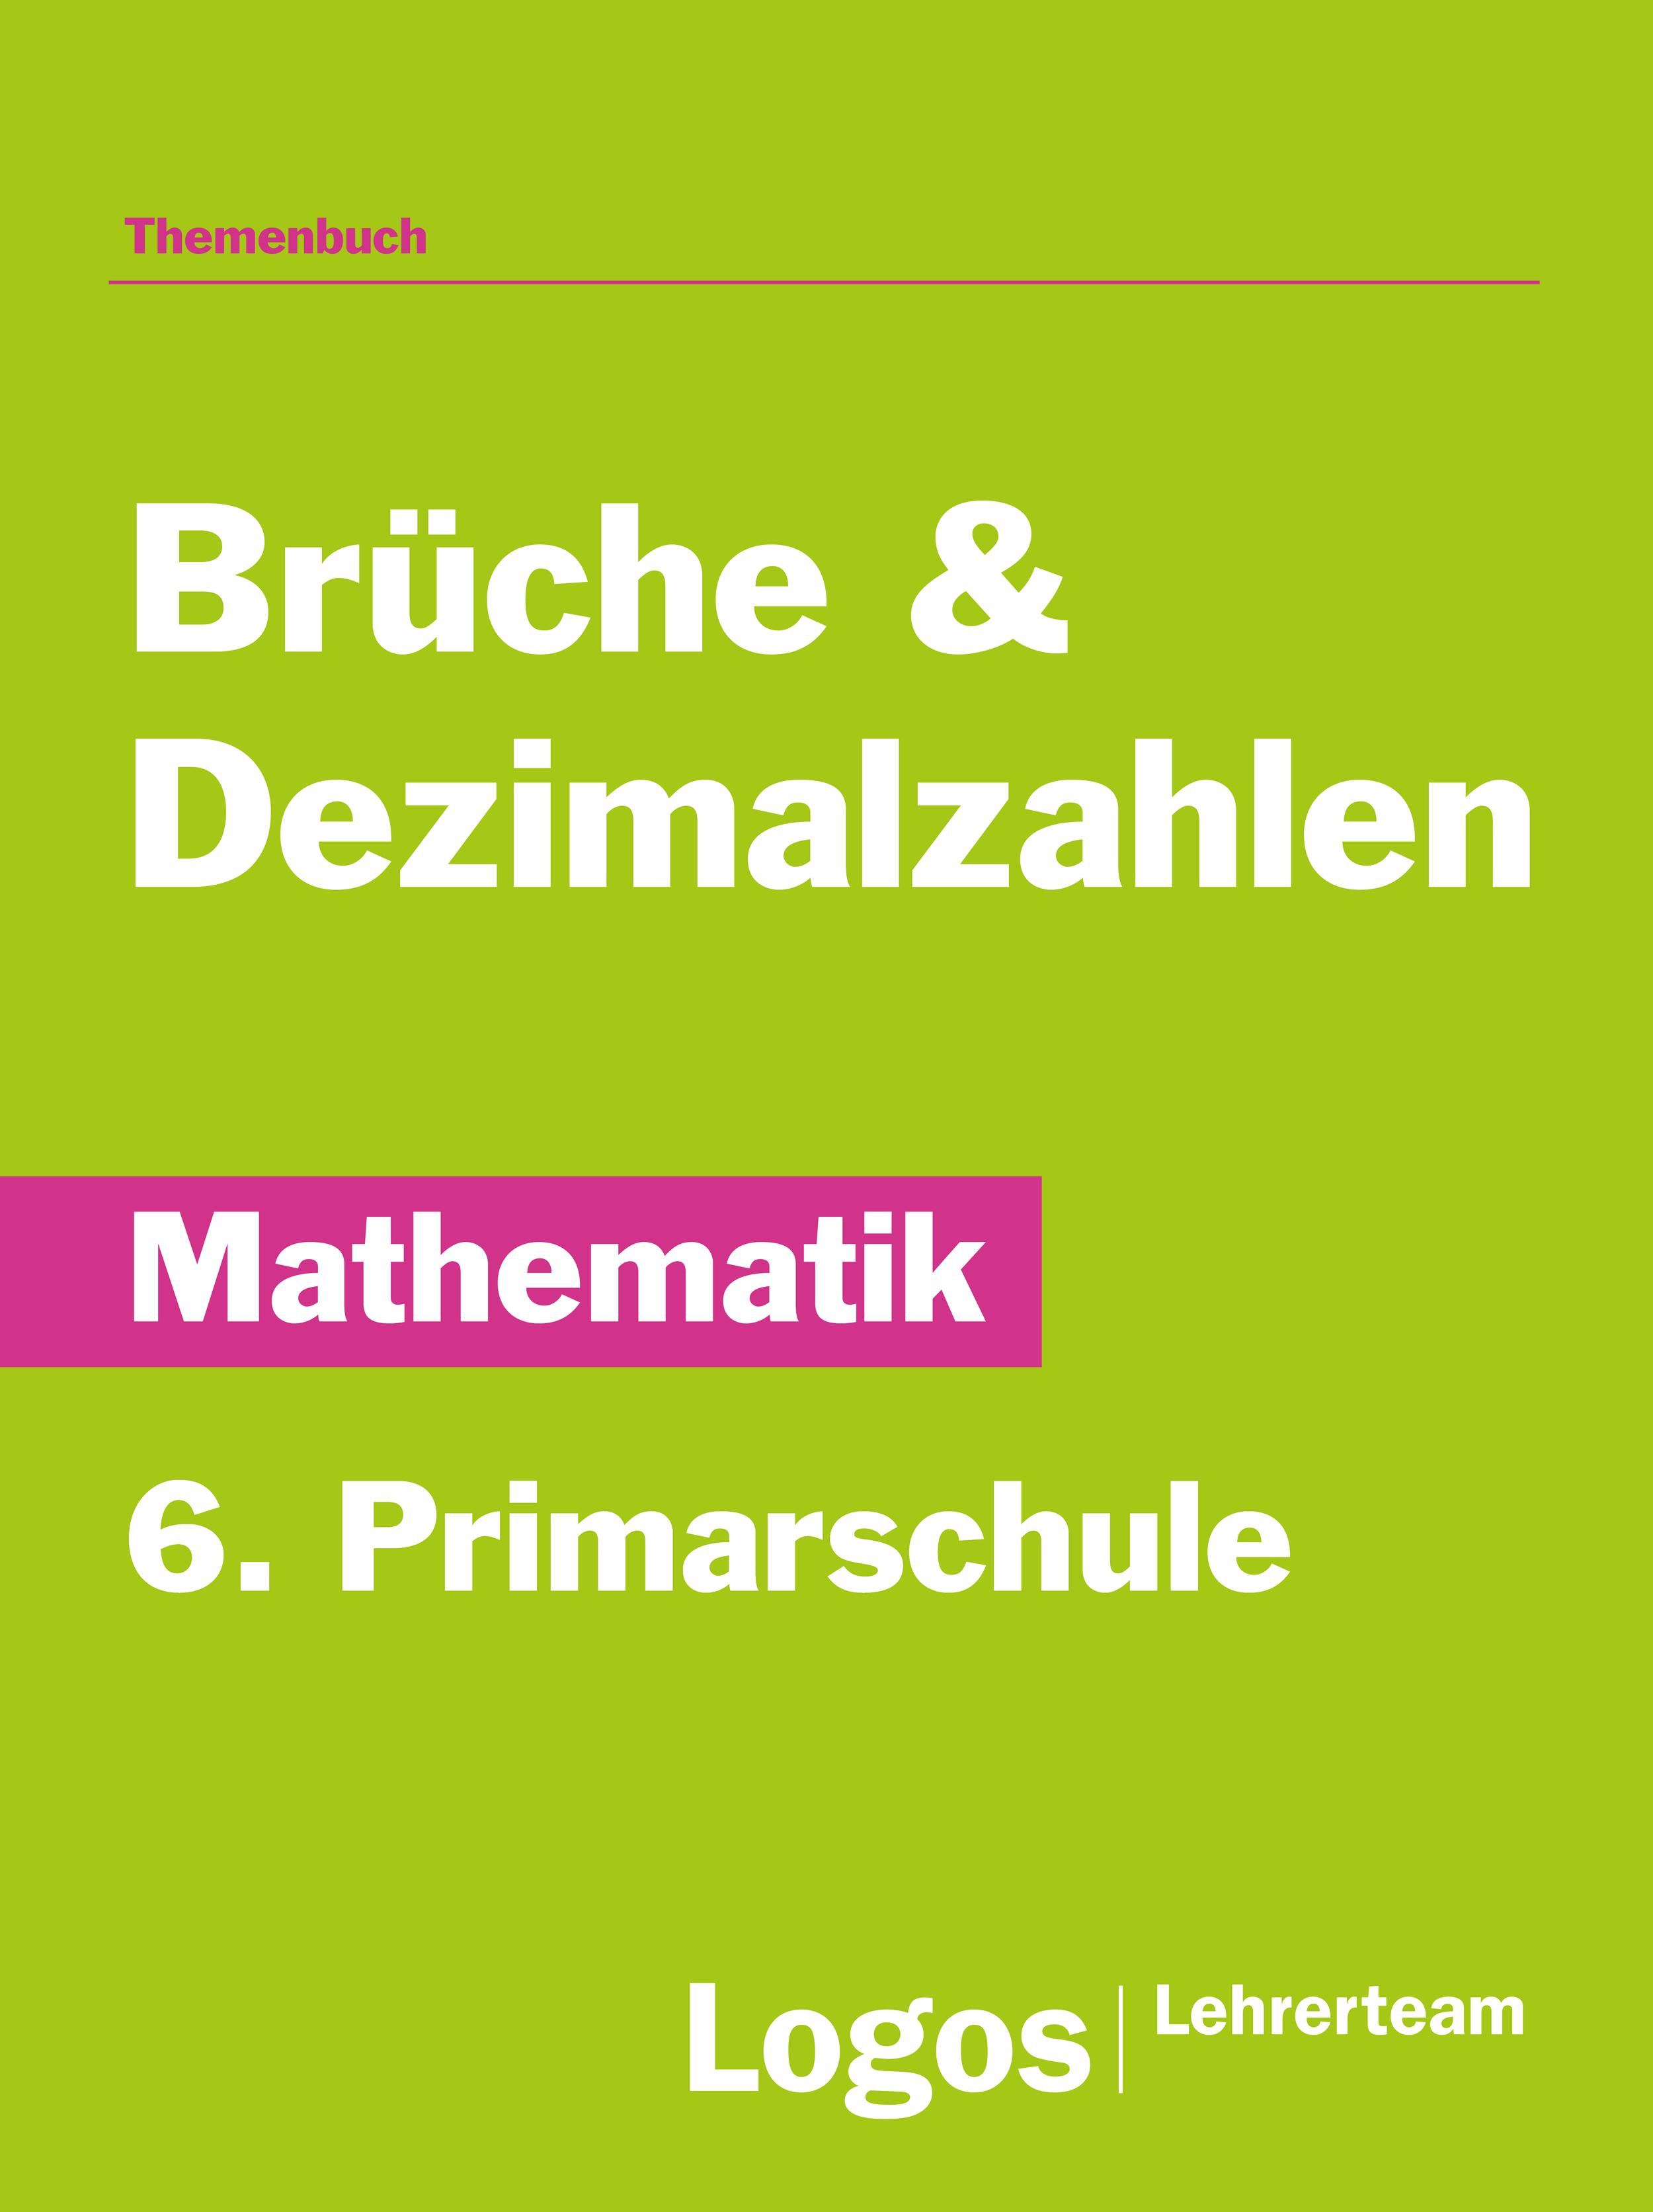 Mathematik Brüche - 6. Primarschule